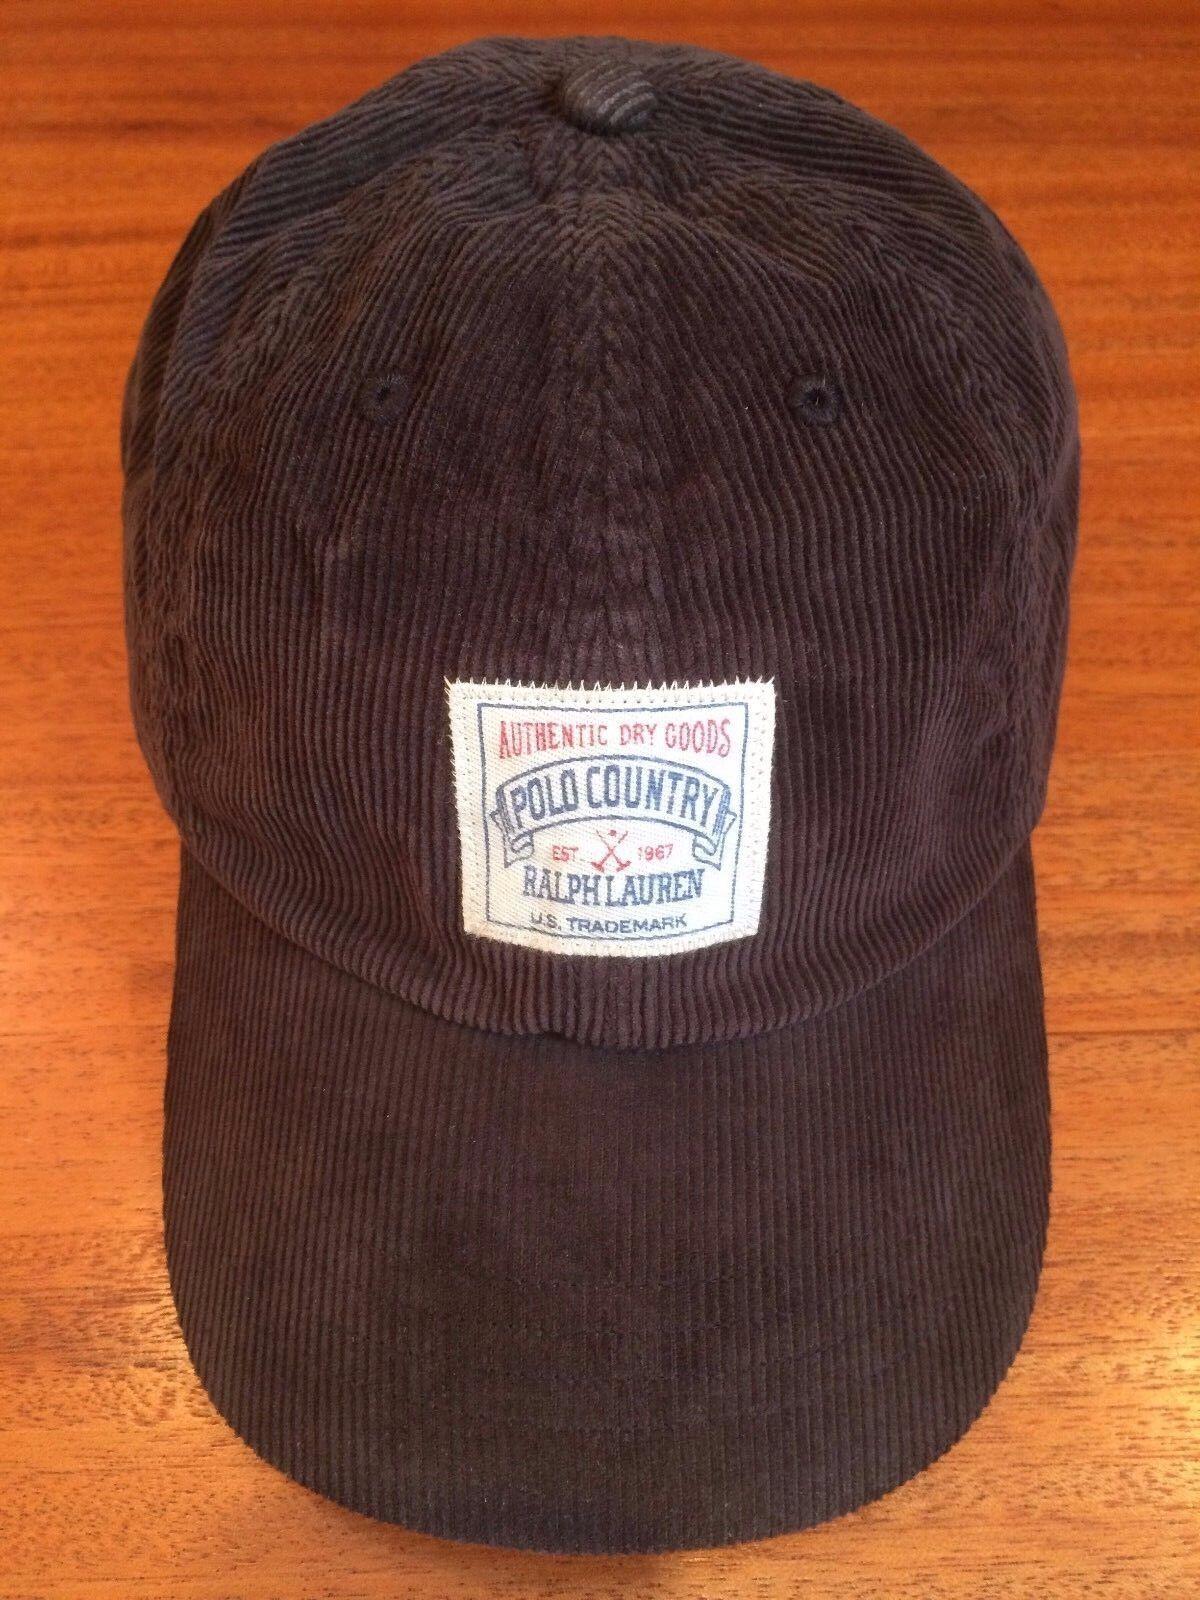 b84bde73a Polo Ralph Lauren Country Outdoor 6 Panel Patch Cap Brown Corduroy ...